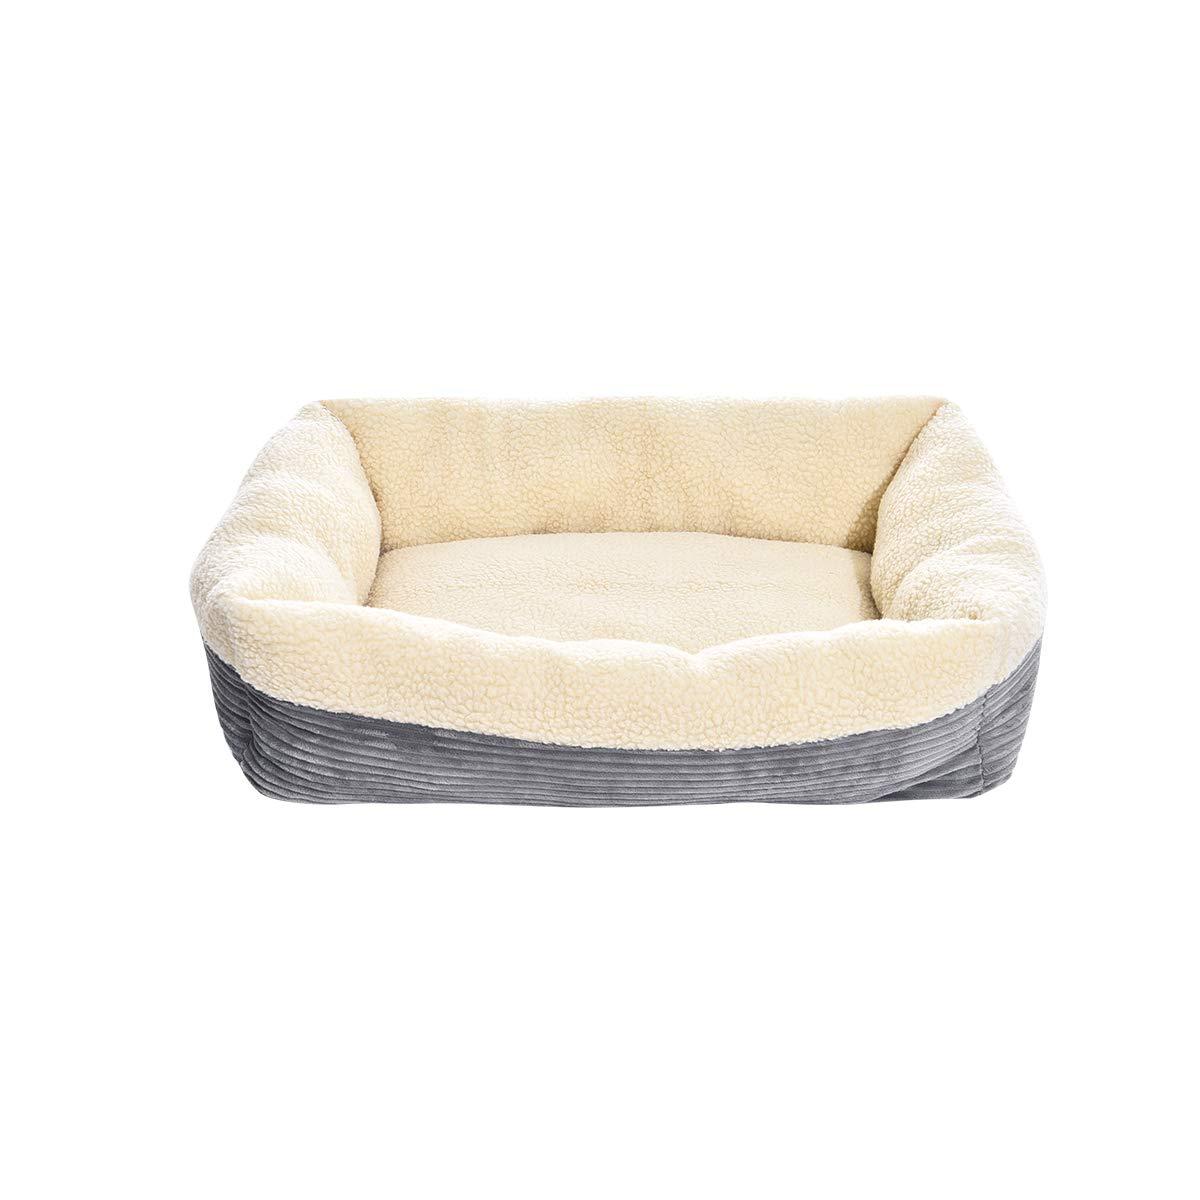 AmazonBasics - Cama cálida para mascotas, 76 cm: Amazon.es: Productos para mascotas